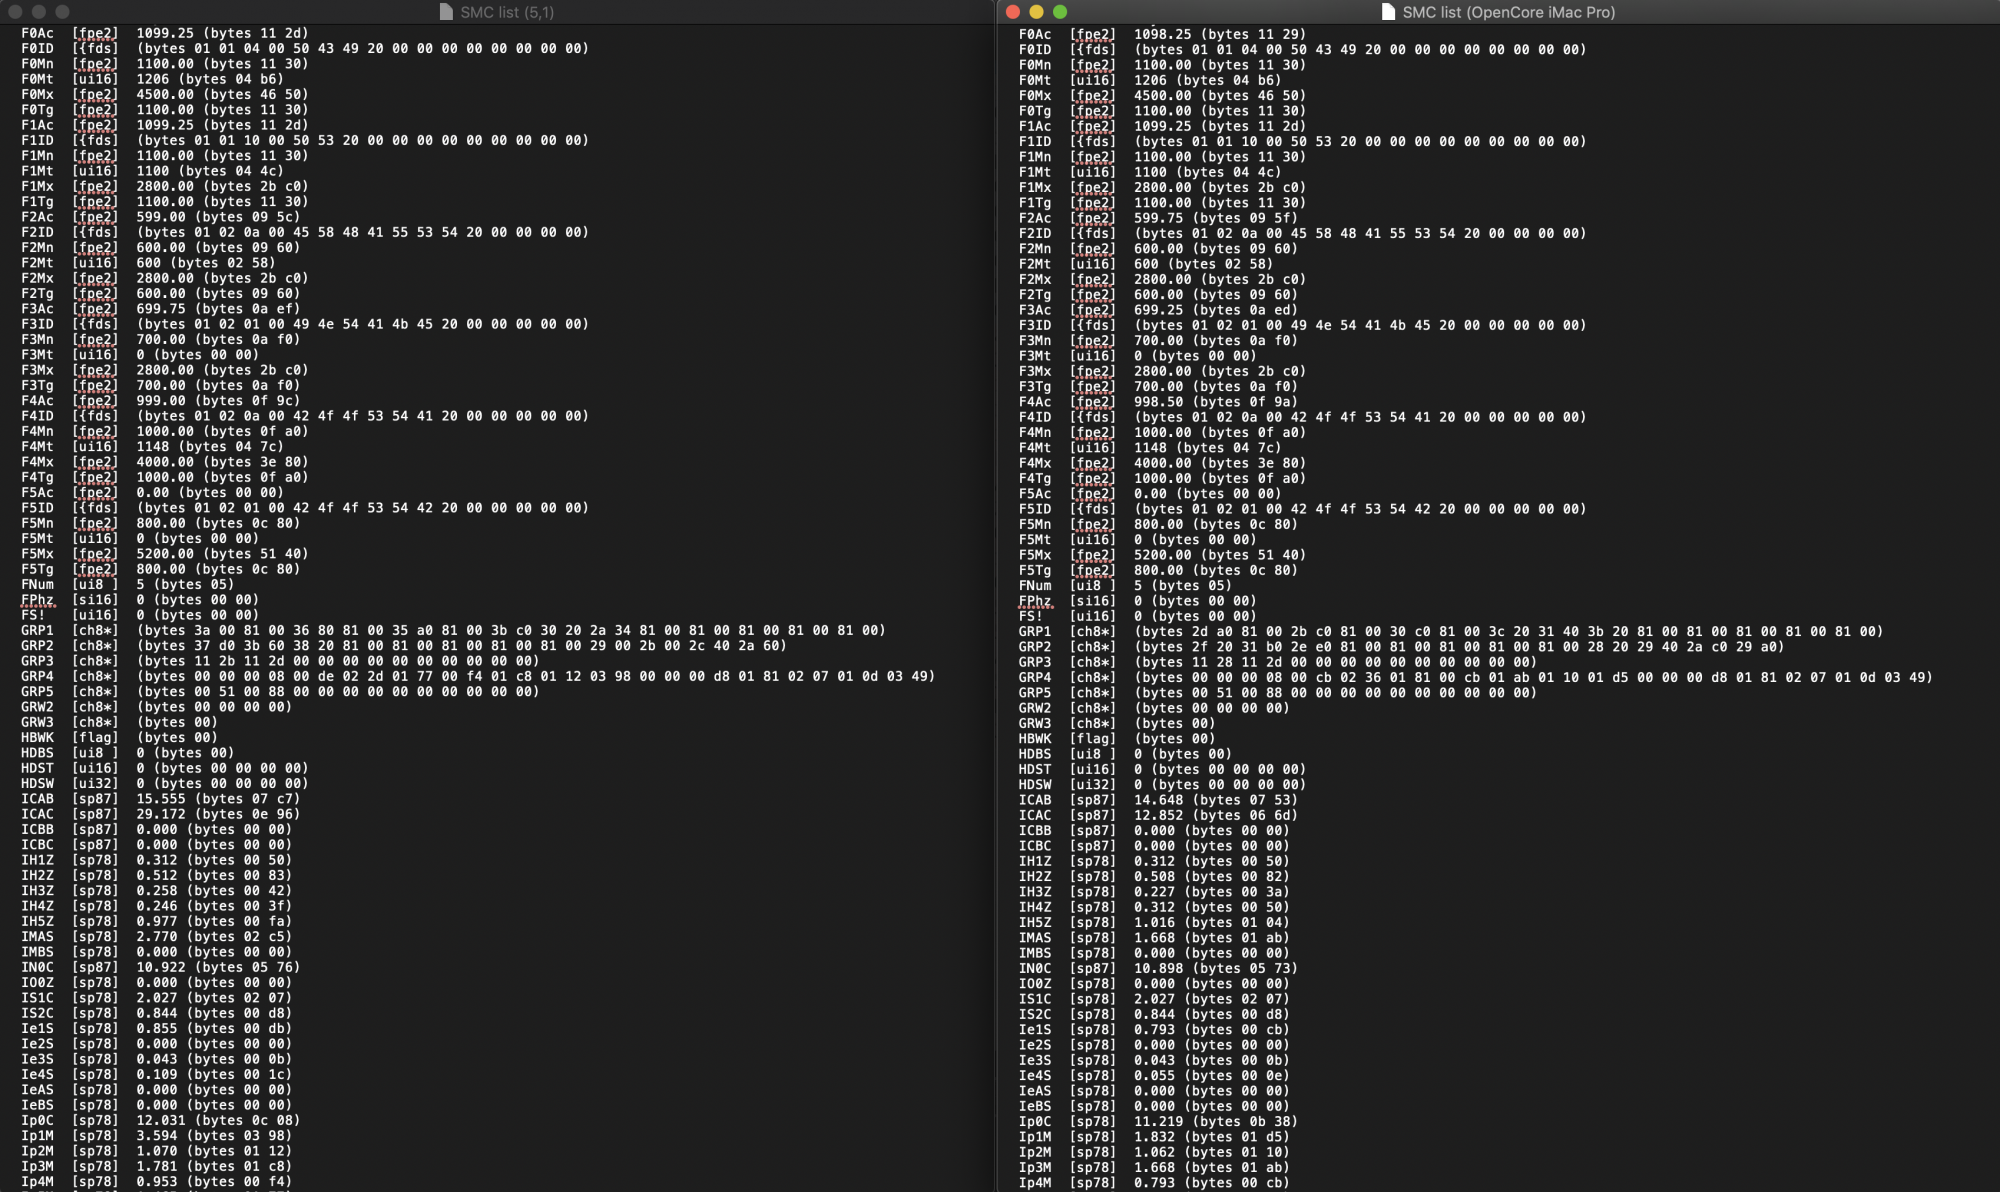 Screenshot 2019-10-31 at 9.54.04 PM.png